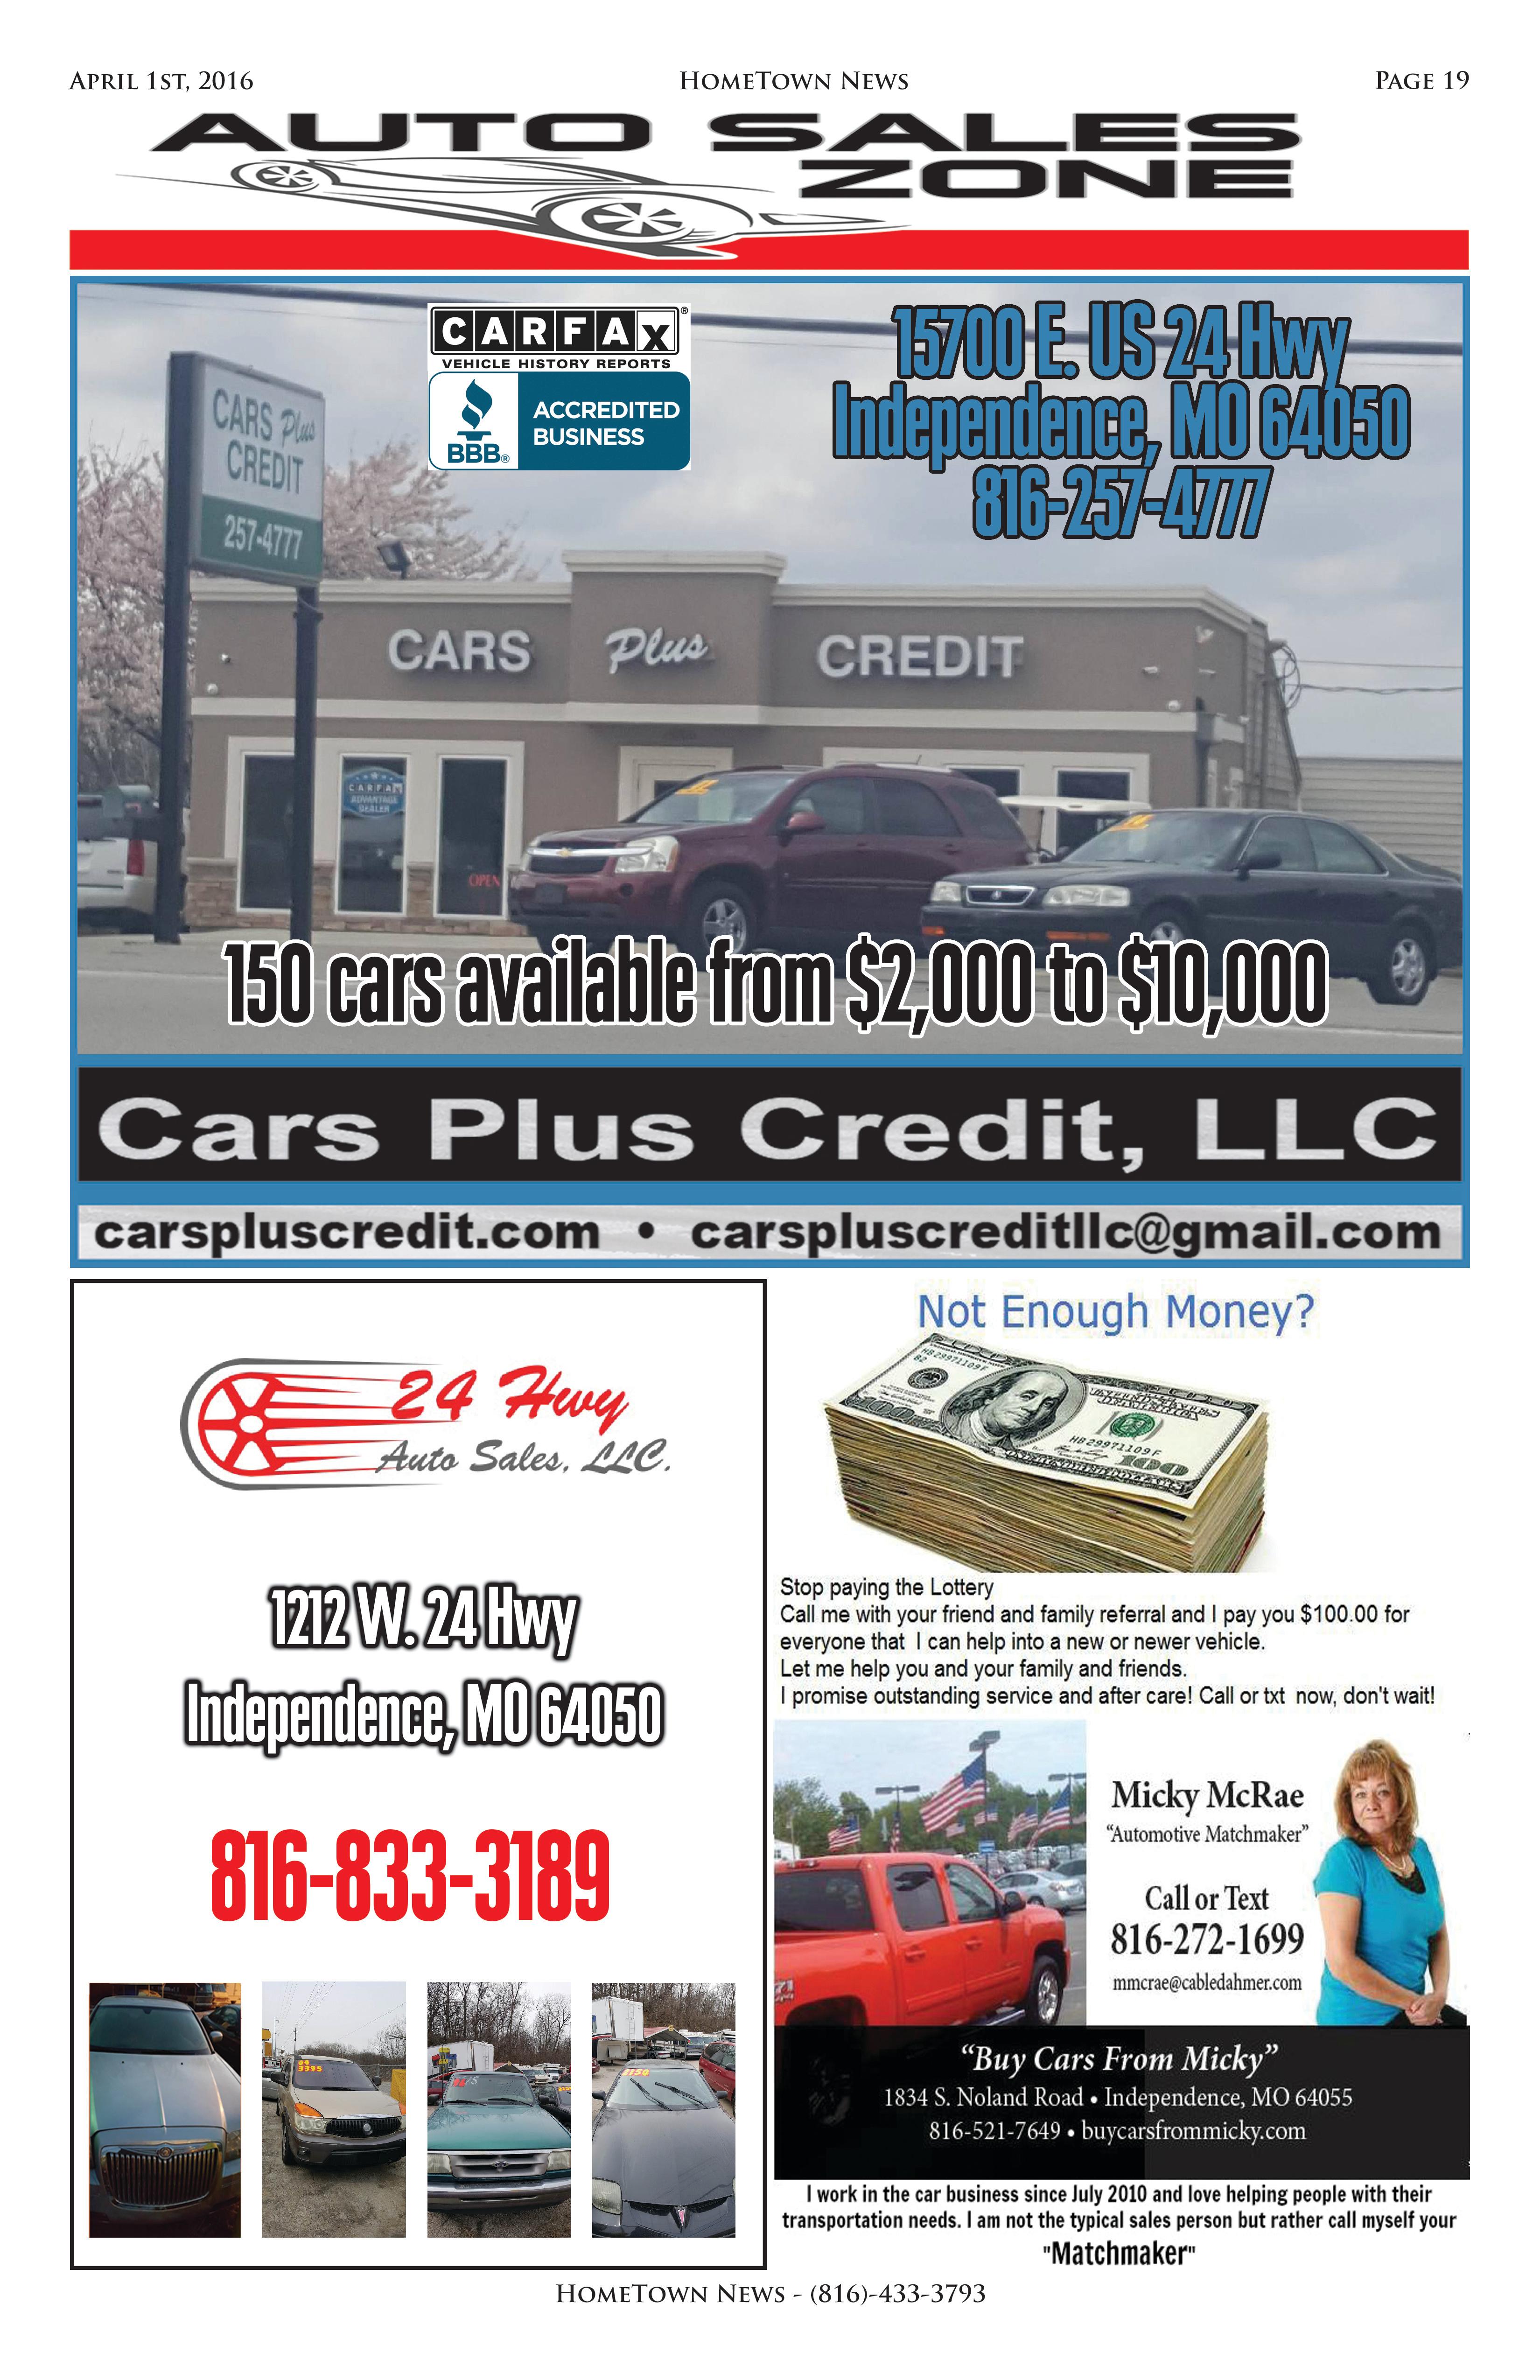 HTN9 - 19 - Auto Sales